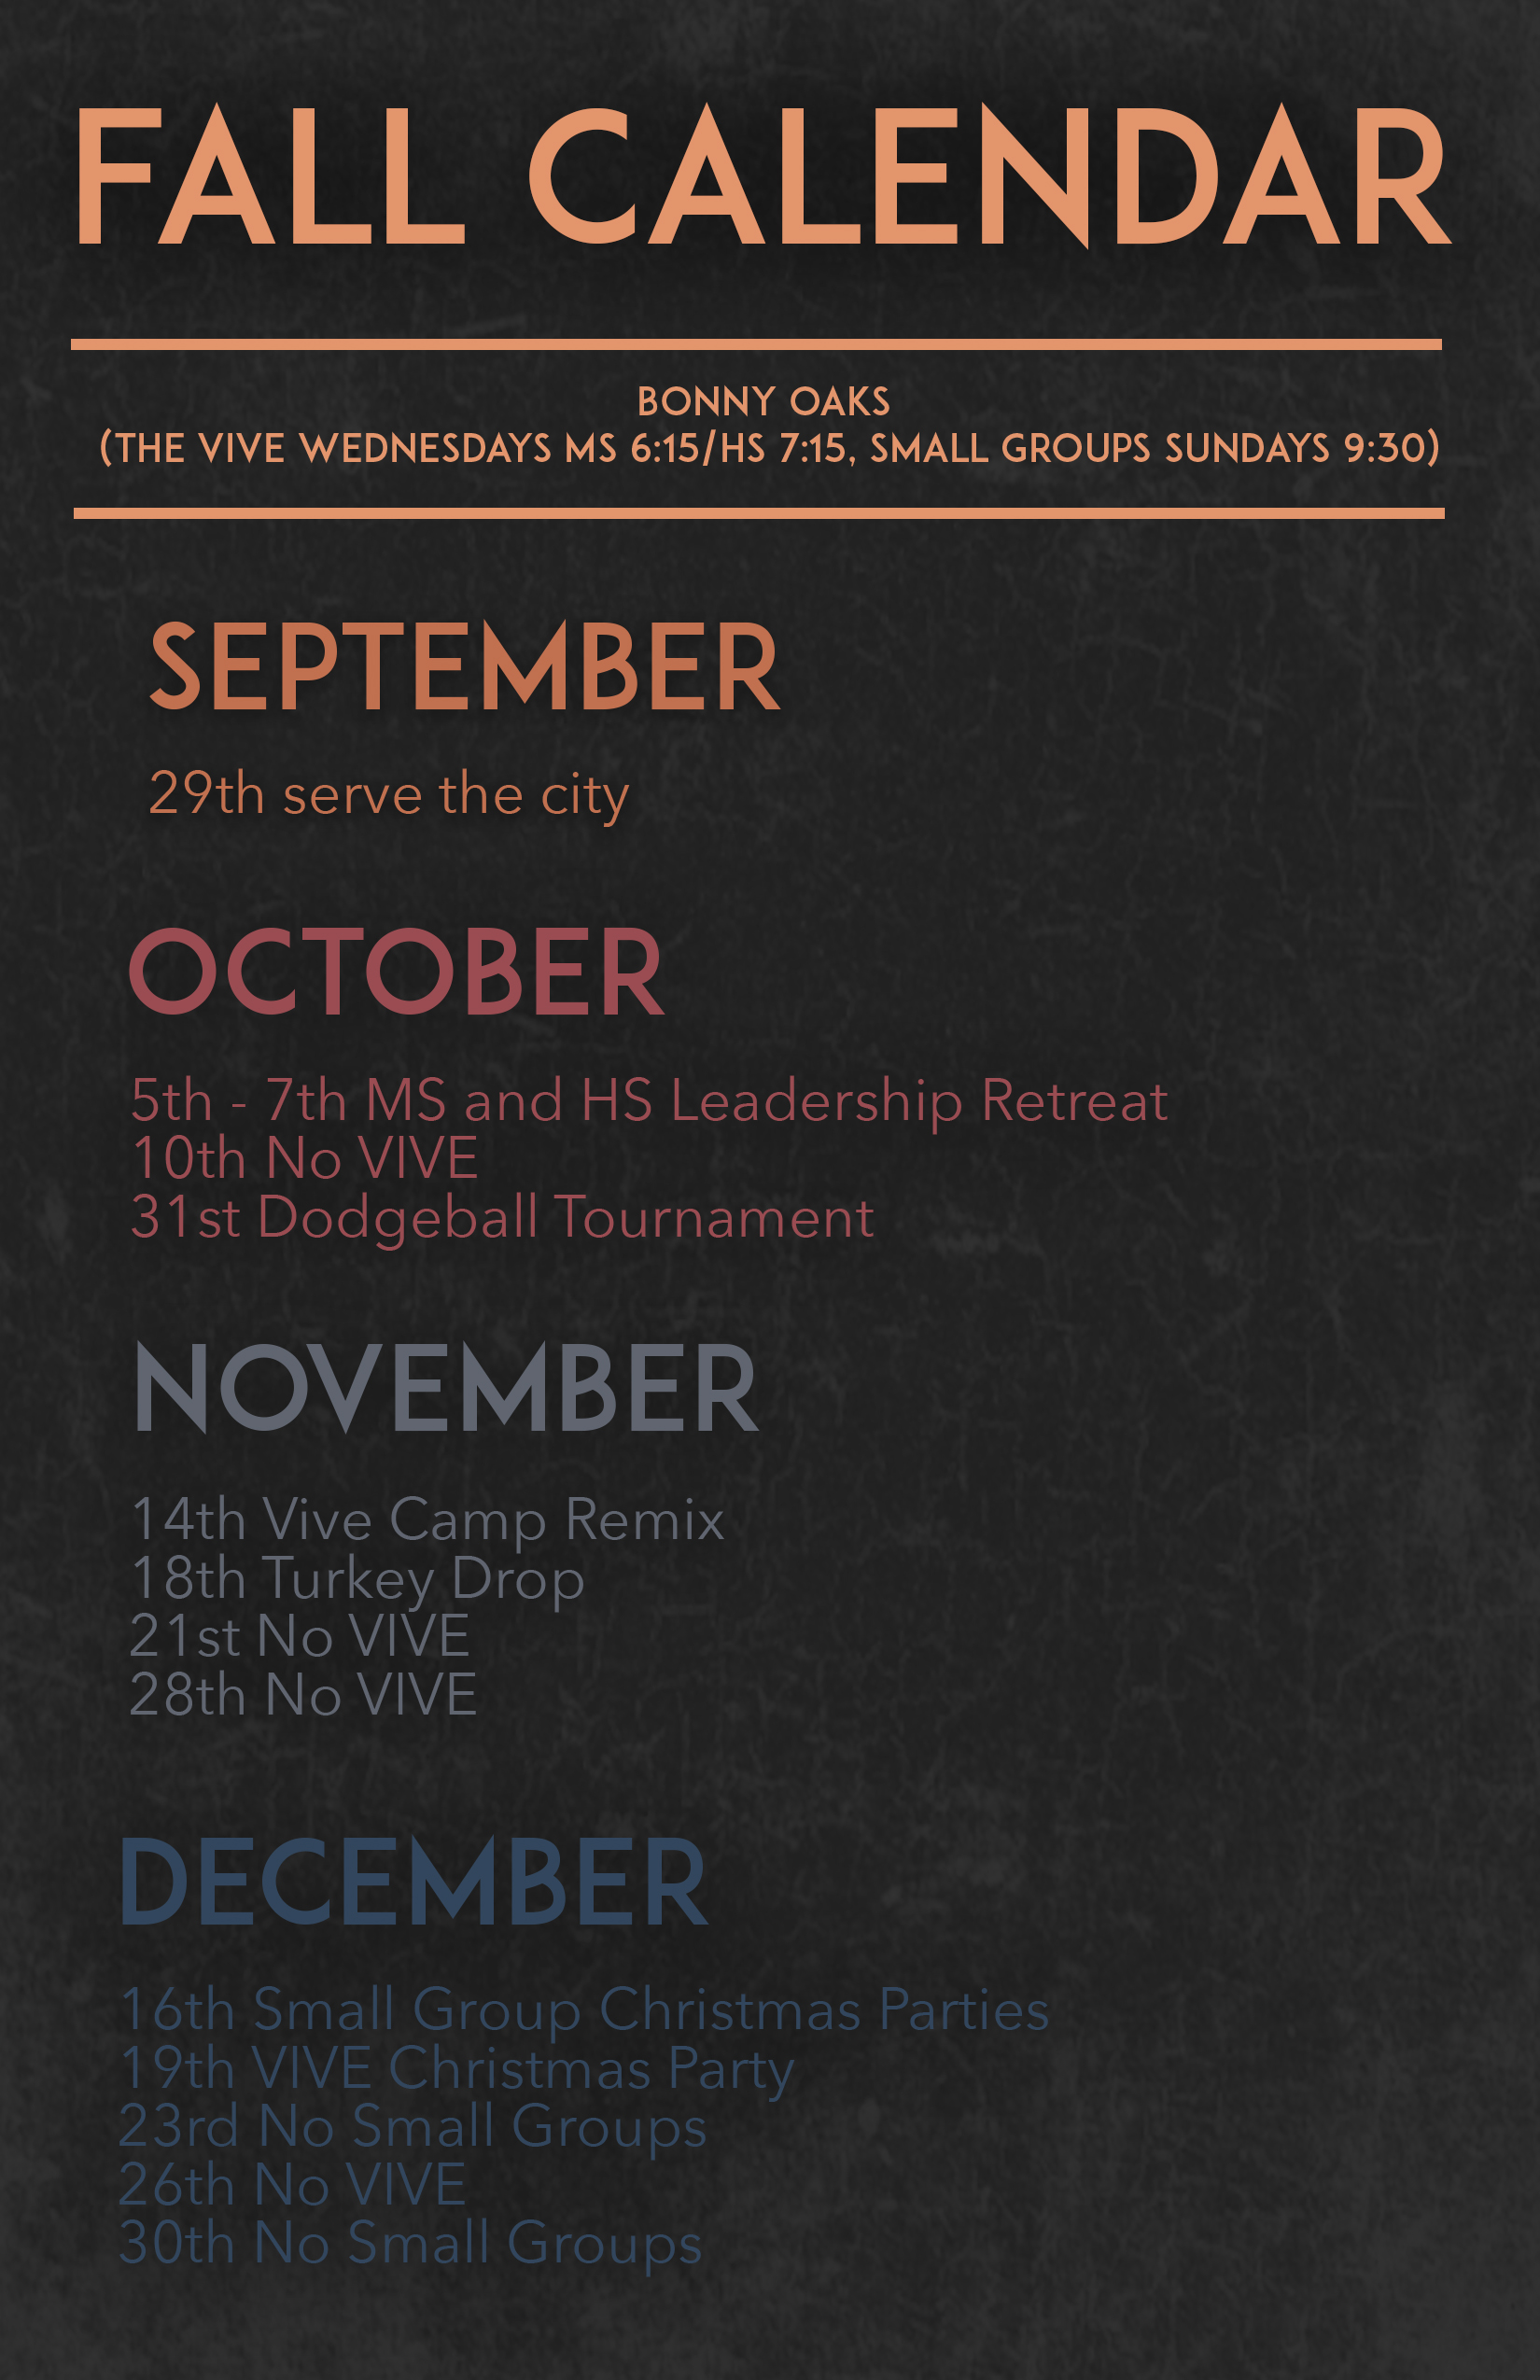 Bonny_Oaks_Fall_Calendar.jpg